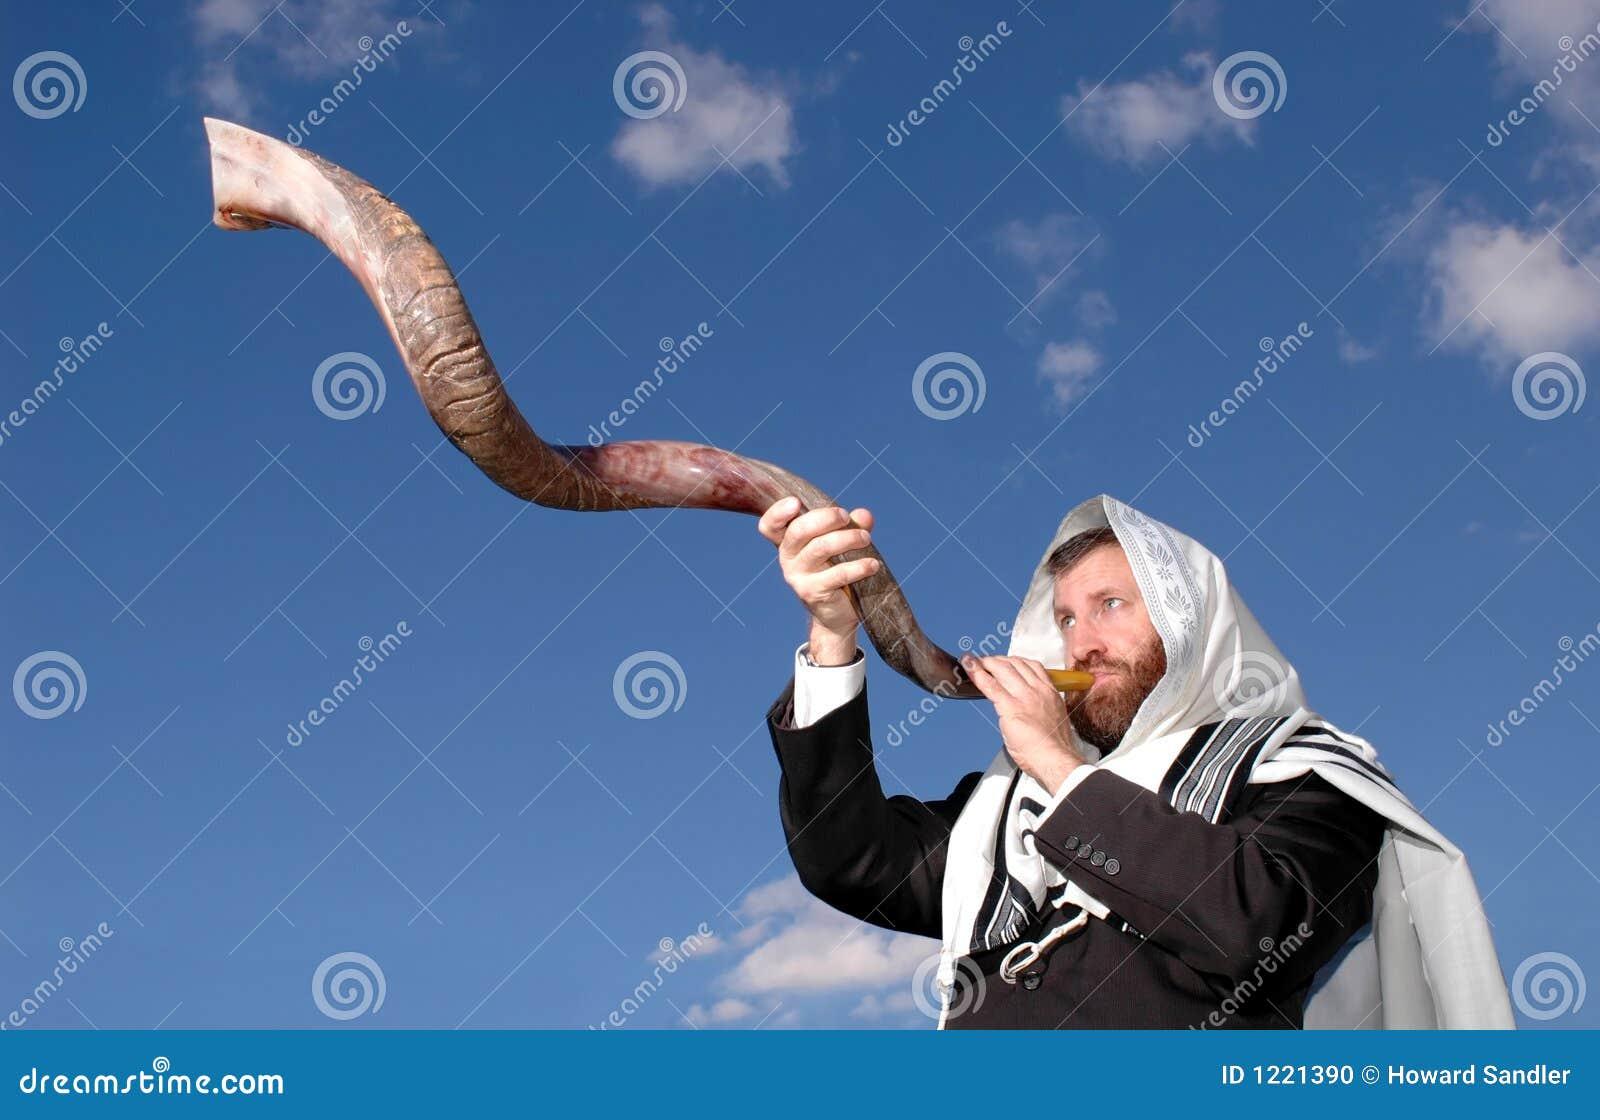 Soando um Shofar iemenita